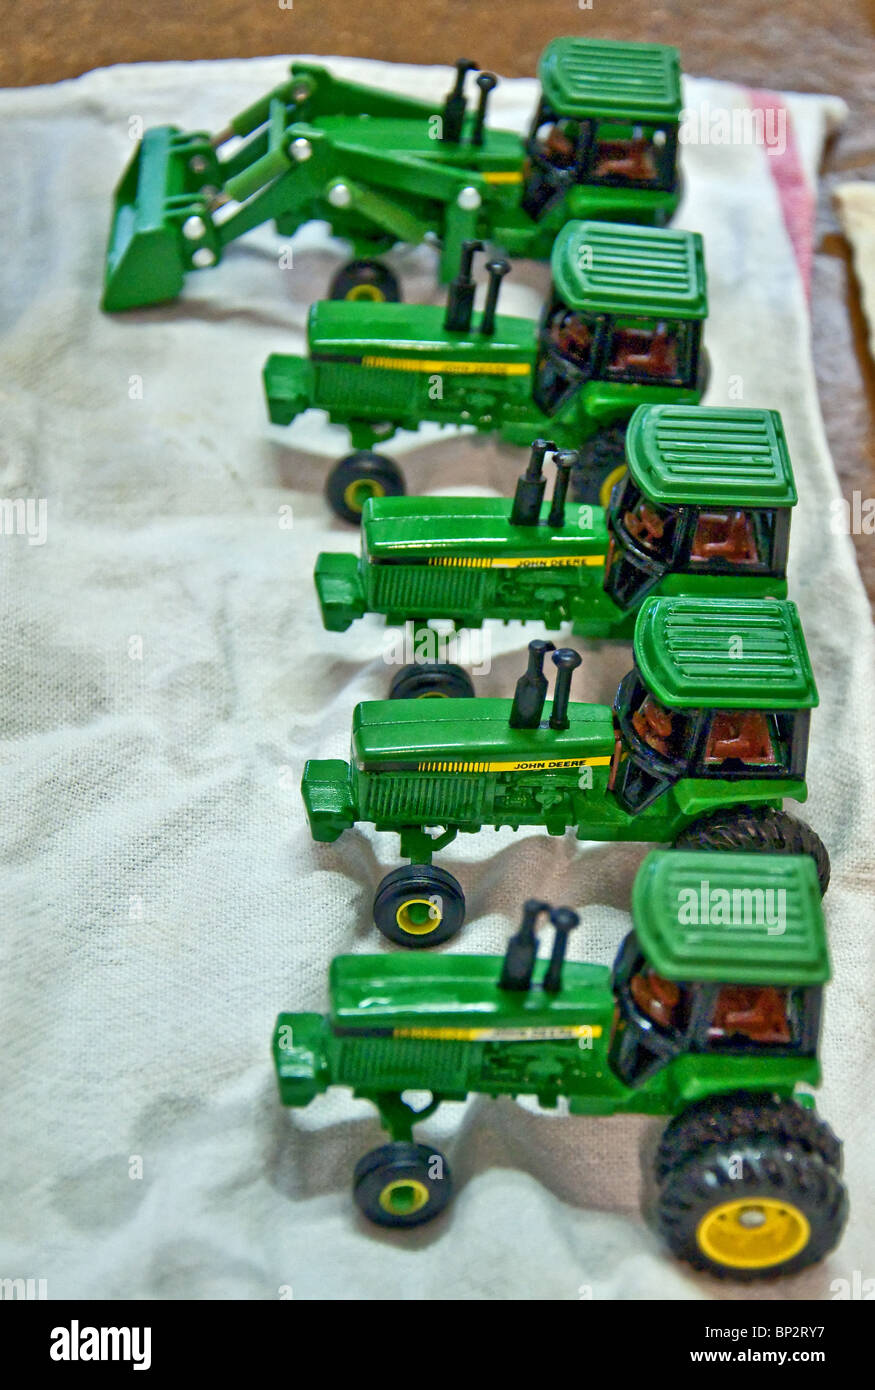 Vintage John Deere Toy Tractors : vintage, deere, tractors, Green, Deere, Vintage, Tractors, Being, Prepped, Stock, Photo, Alamy